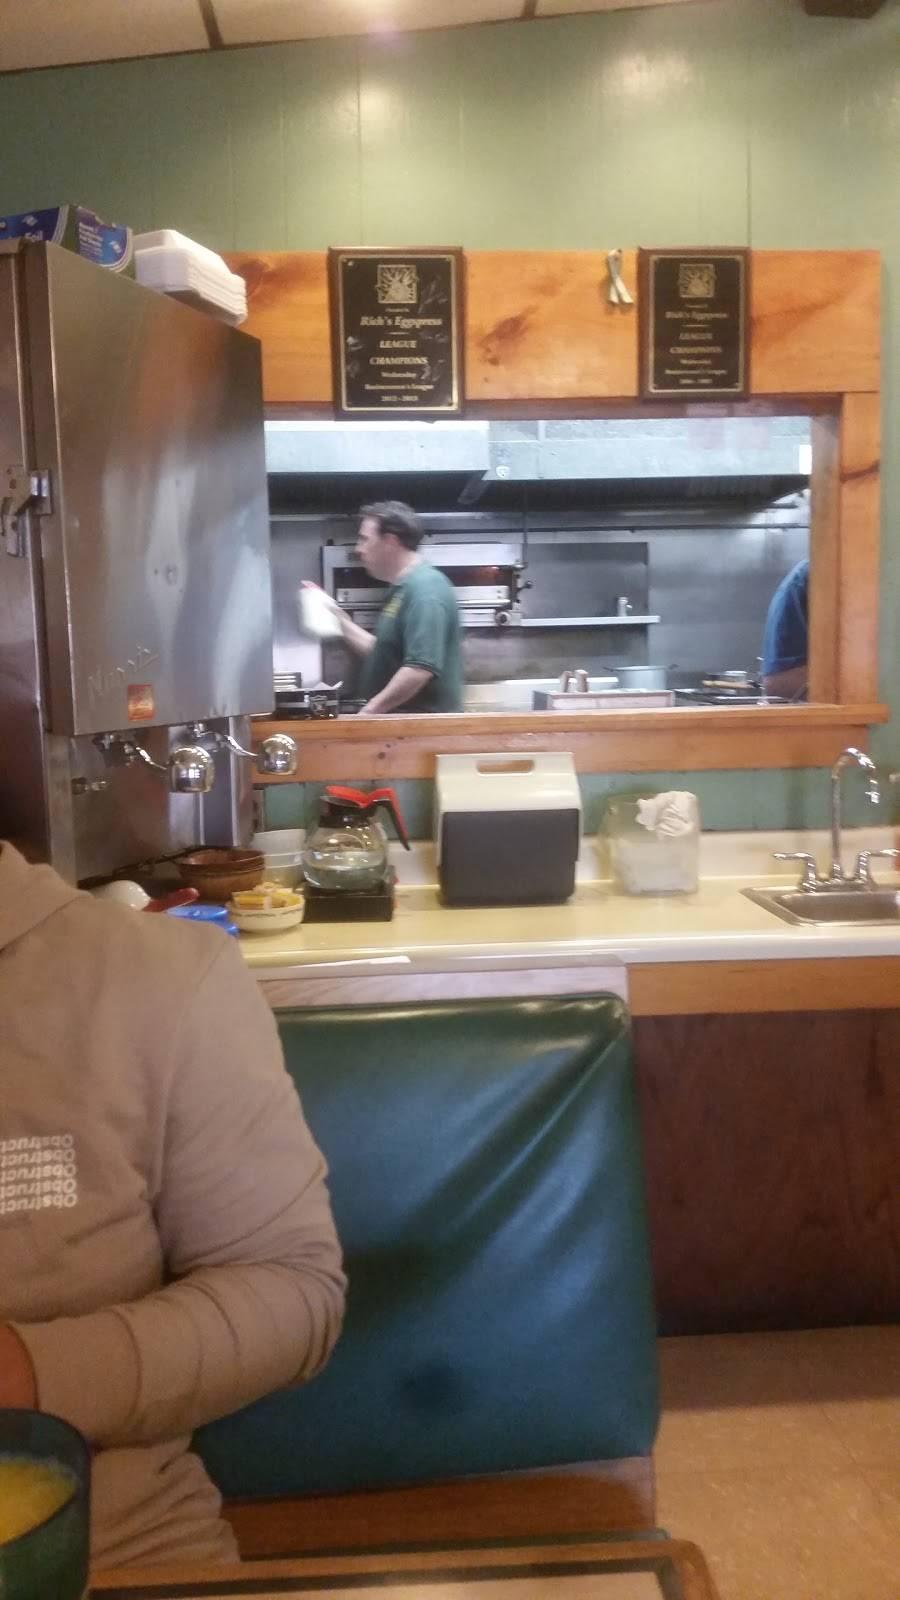 Richs Eggspress   restaurant   1622 Thomaston Ave, Waterbury, CT 06704, USA   2037556105 OR +1 203-755-6105